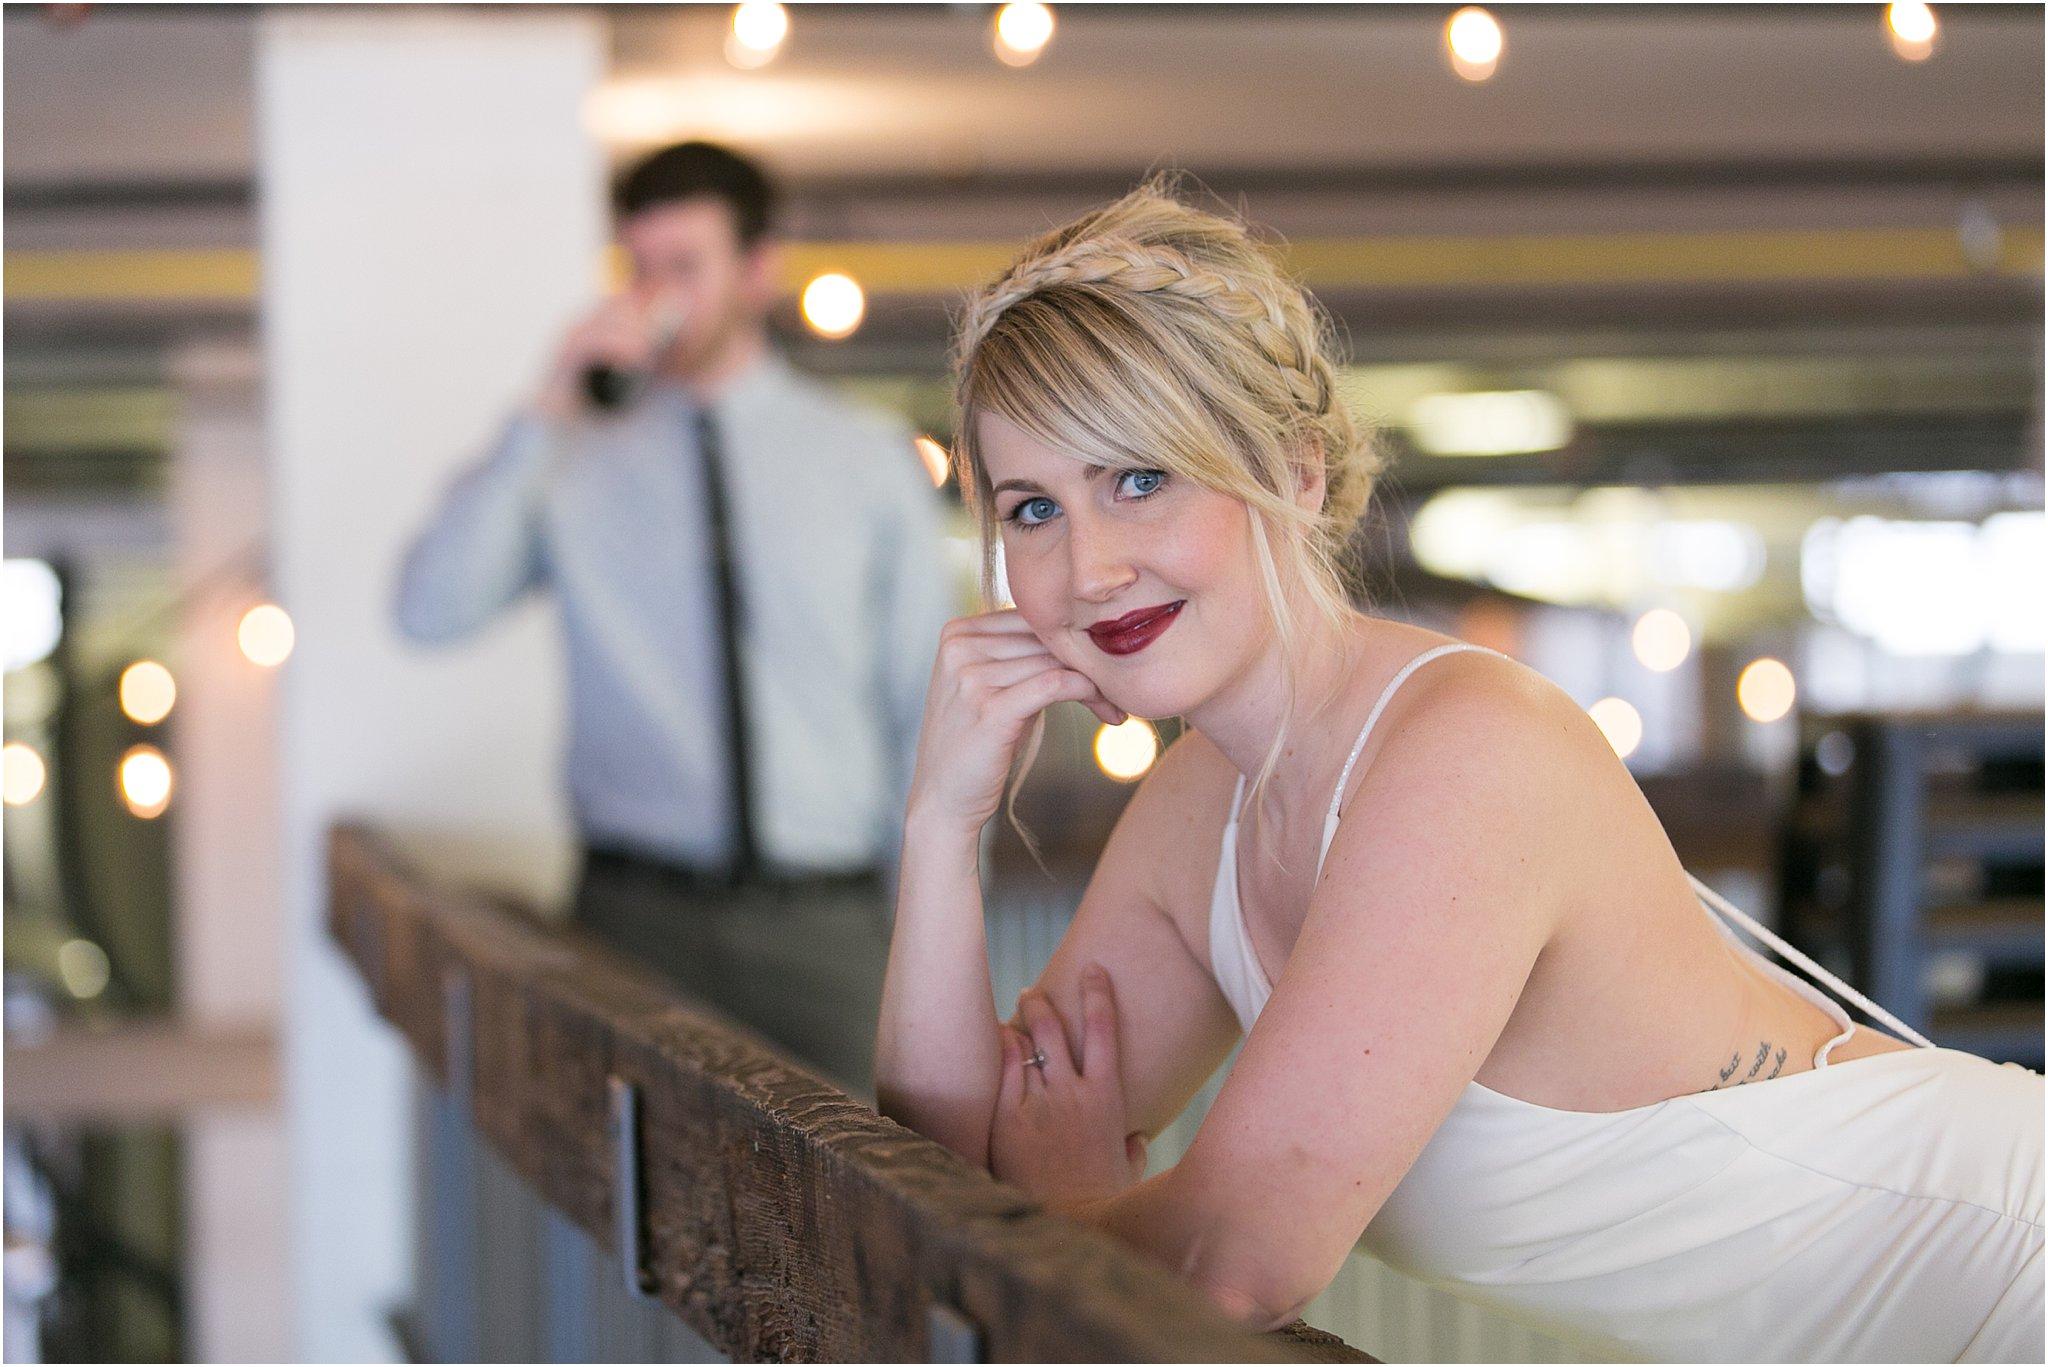 jessica_ryan_photography_oconnor_brewing_wedding_oconnor_brewing_co_norfolk_virginia_roost_flowers_blue_birds_garage__0776